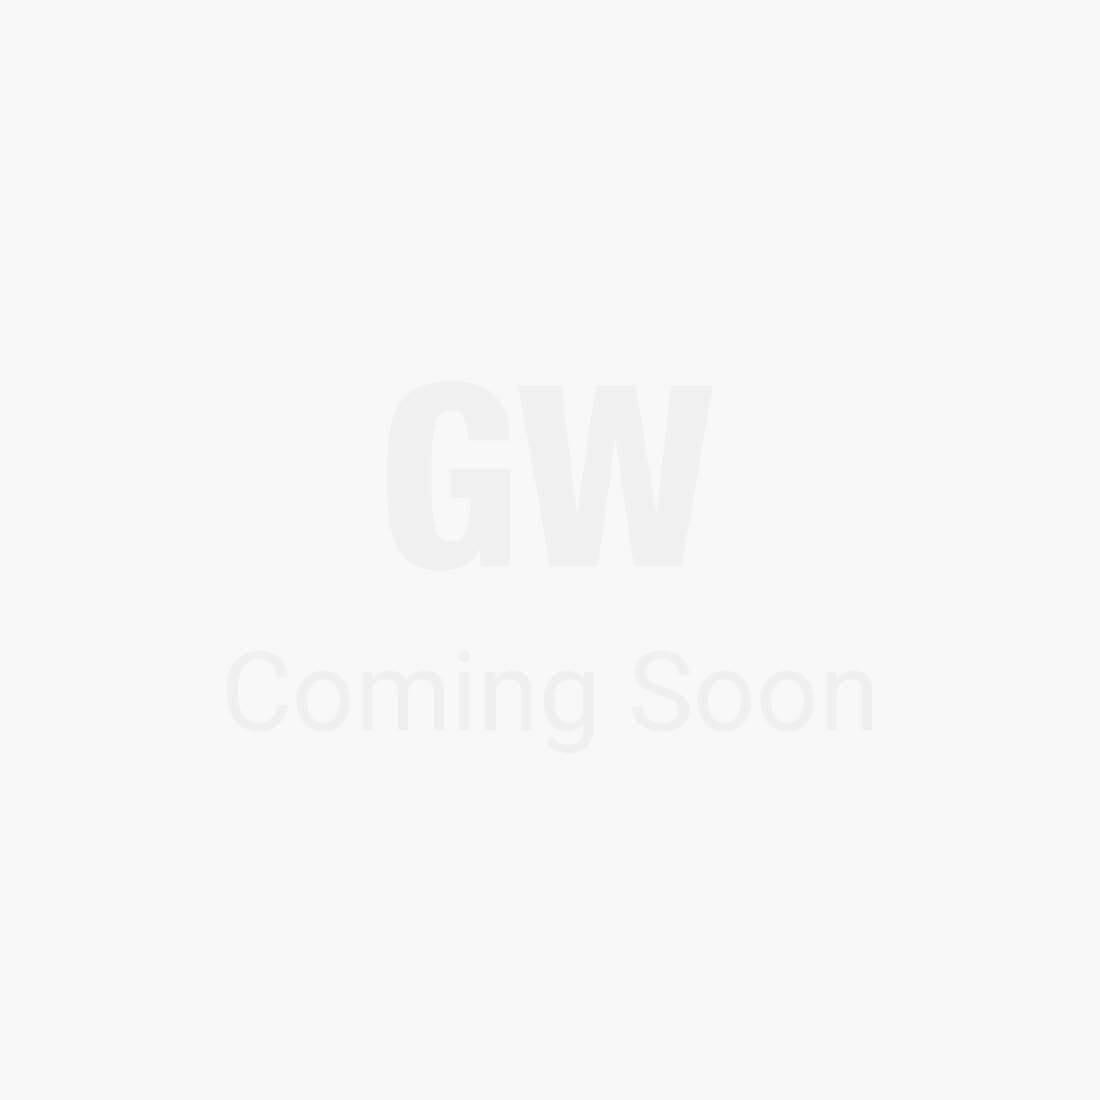 Vittoria Gilbert 1 Seater Centre Large Sofa